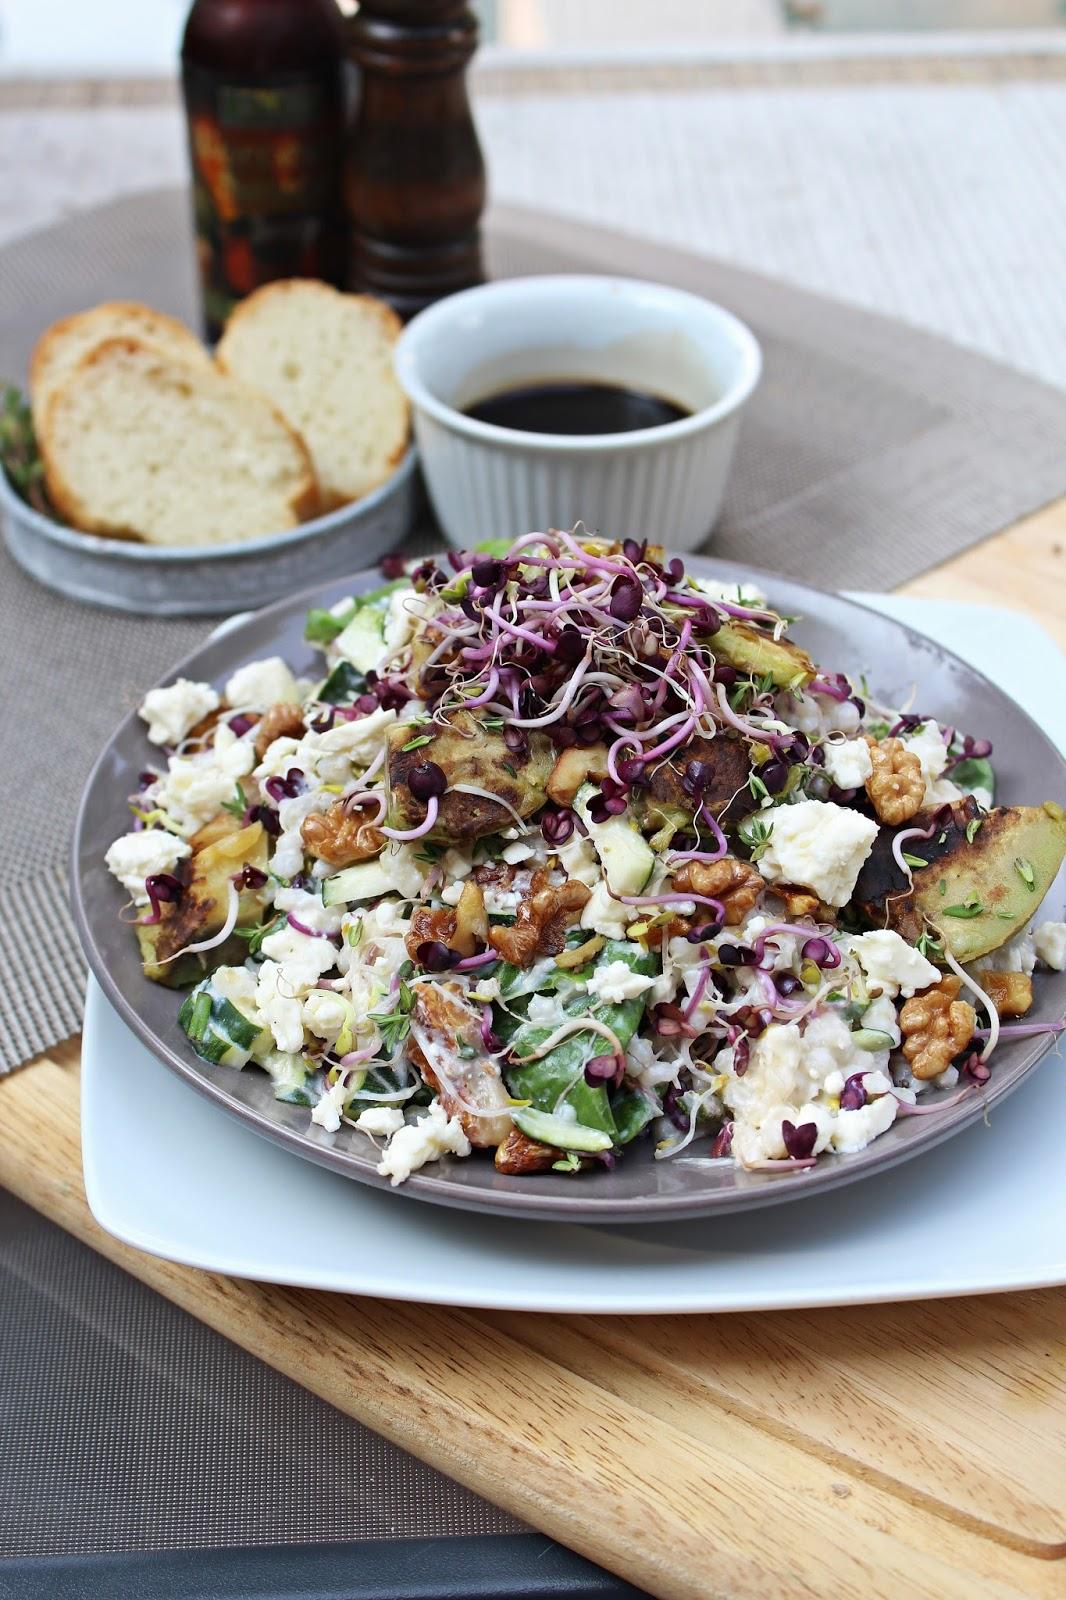 backtrinchen nach jamie oliver the healthiest salad i 39 ll eat this week. Black Bedroom Furniture Sets. Home Design Ideas